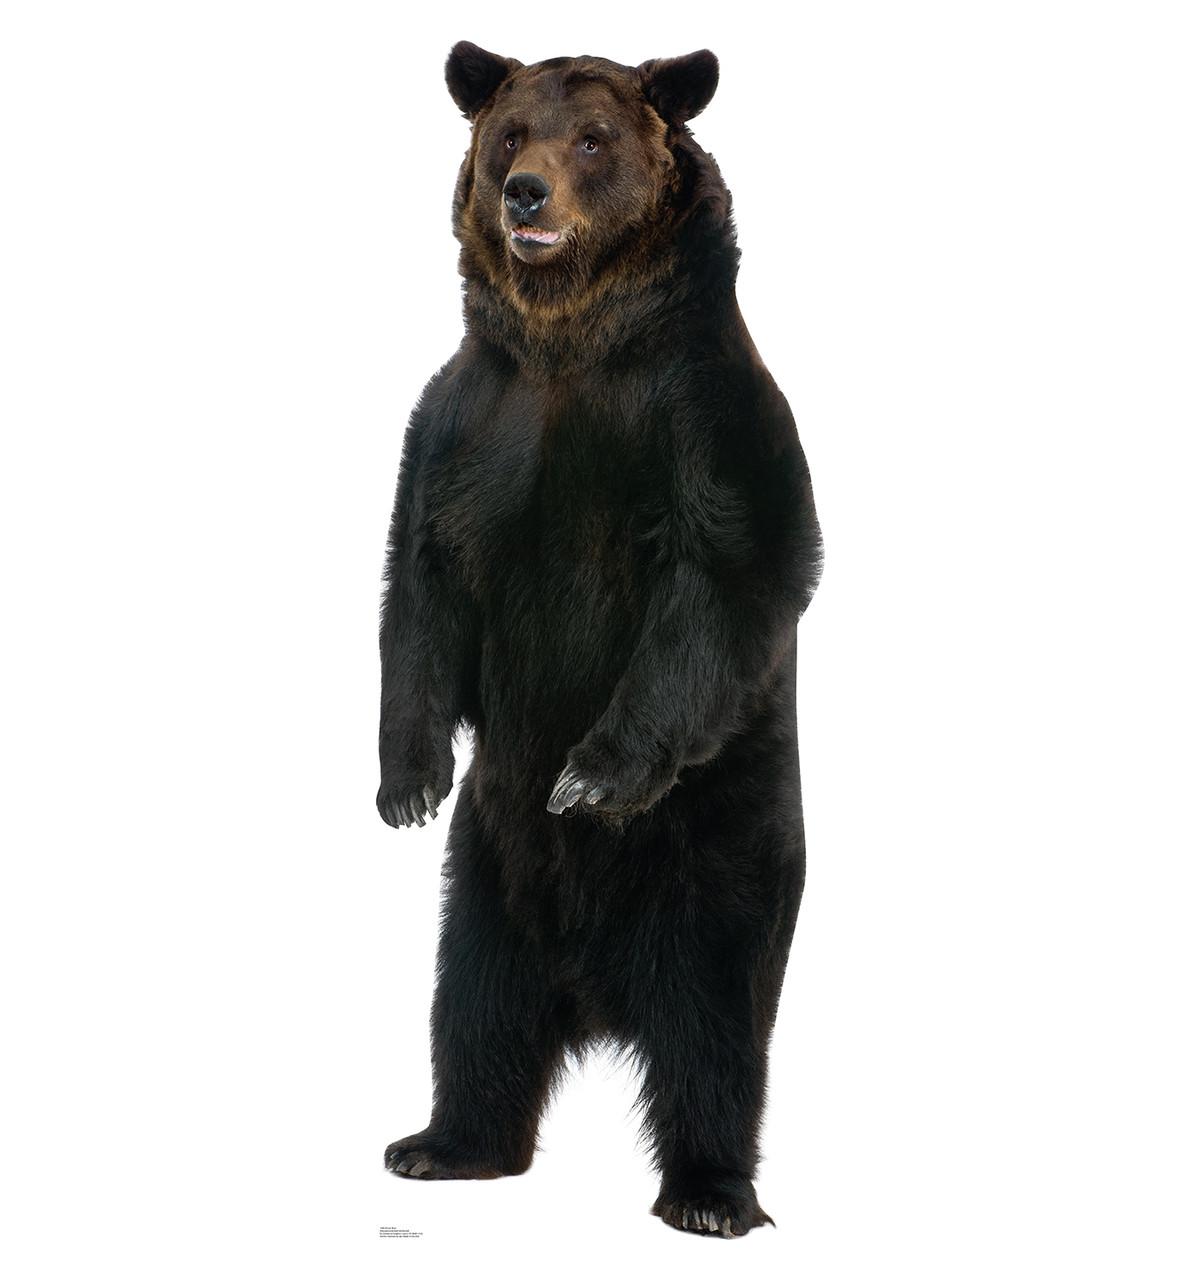 Brown Bear Talking - Cardboard Cutout